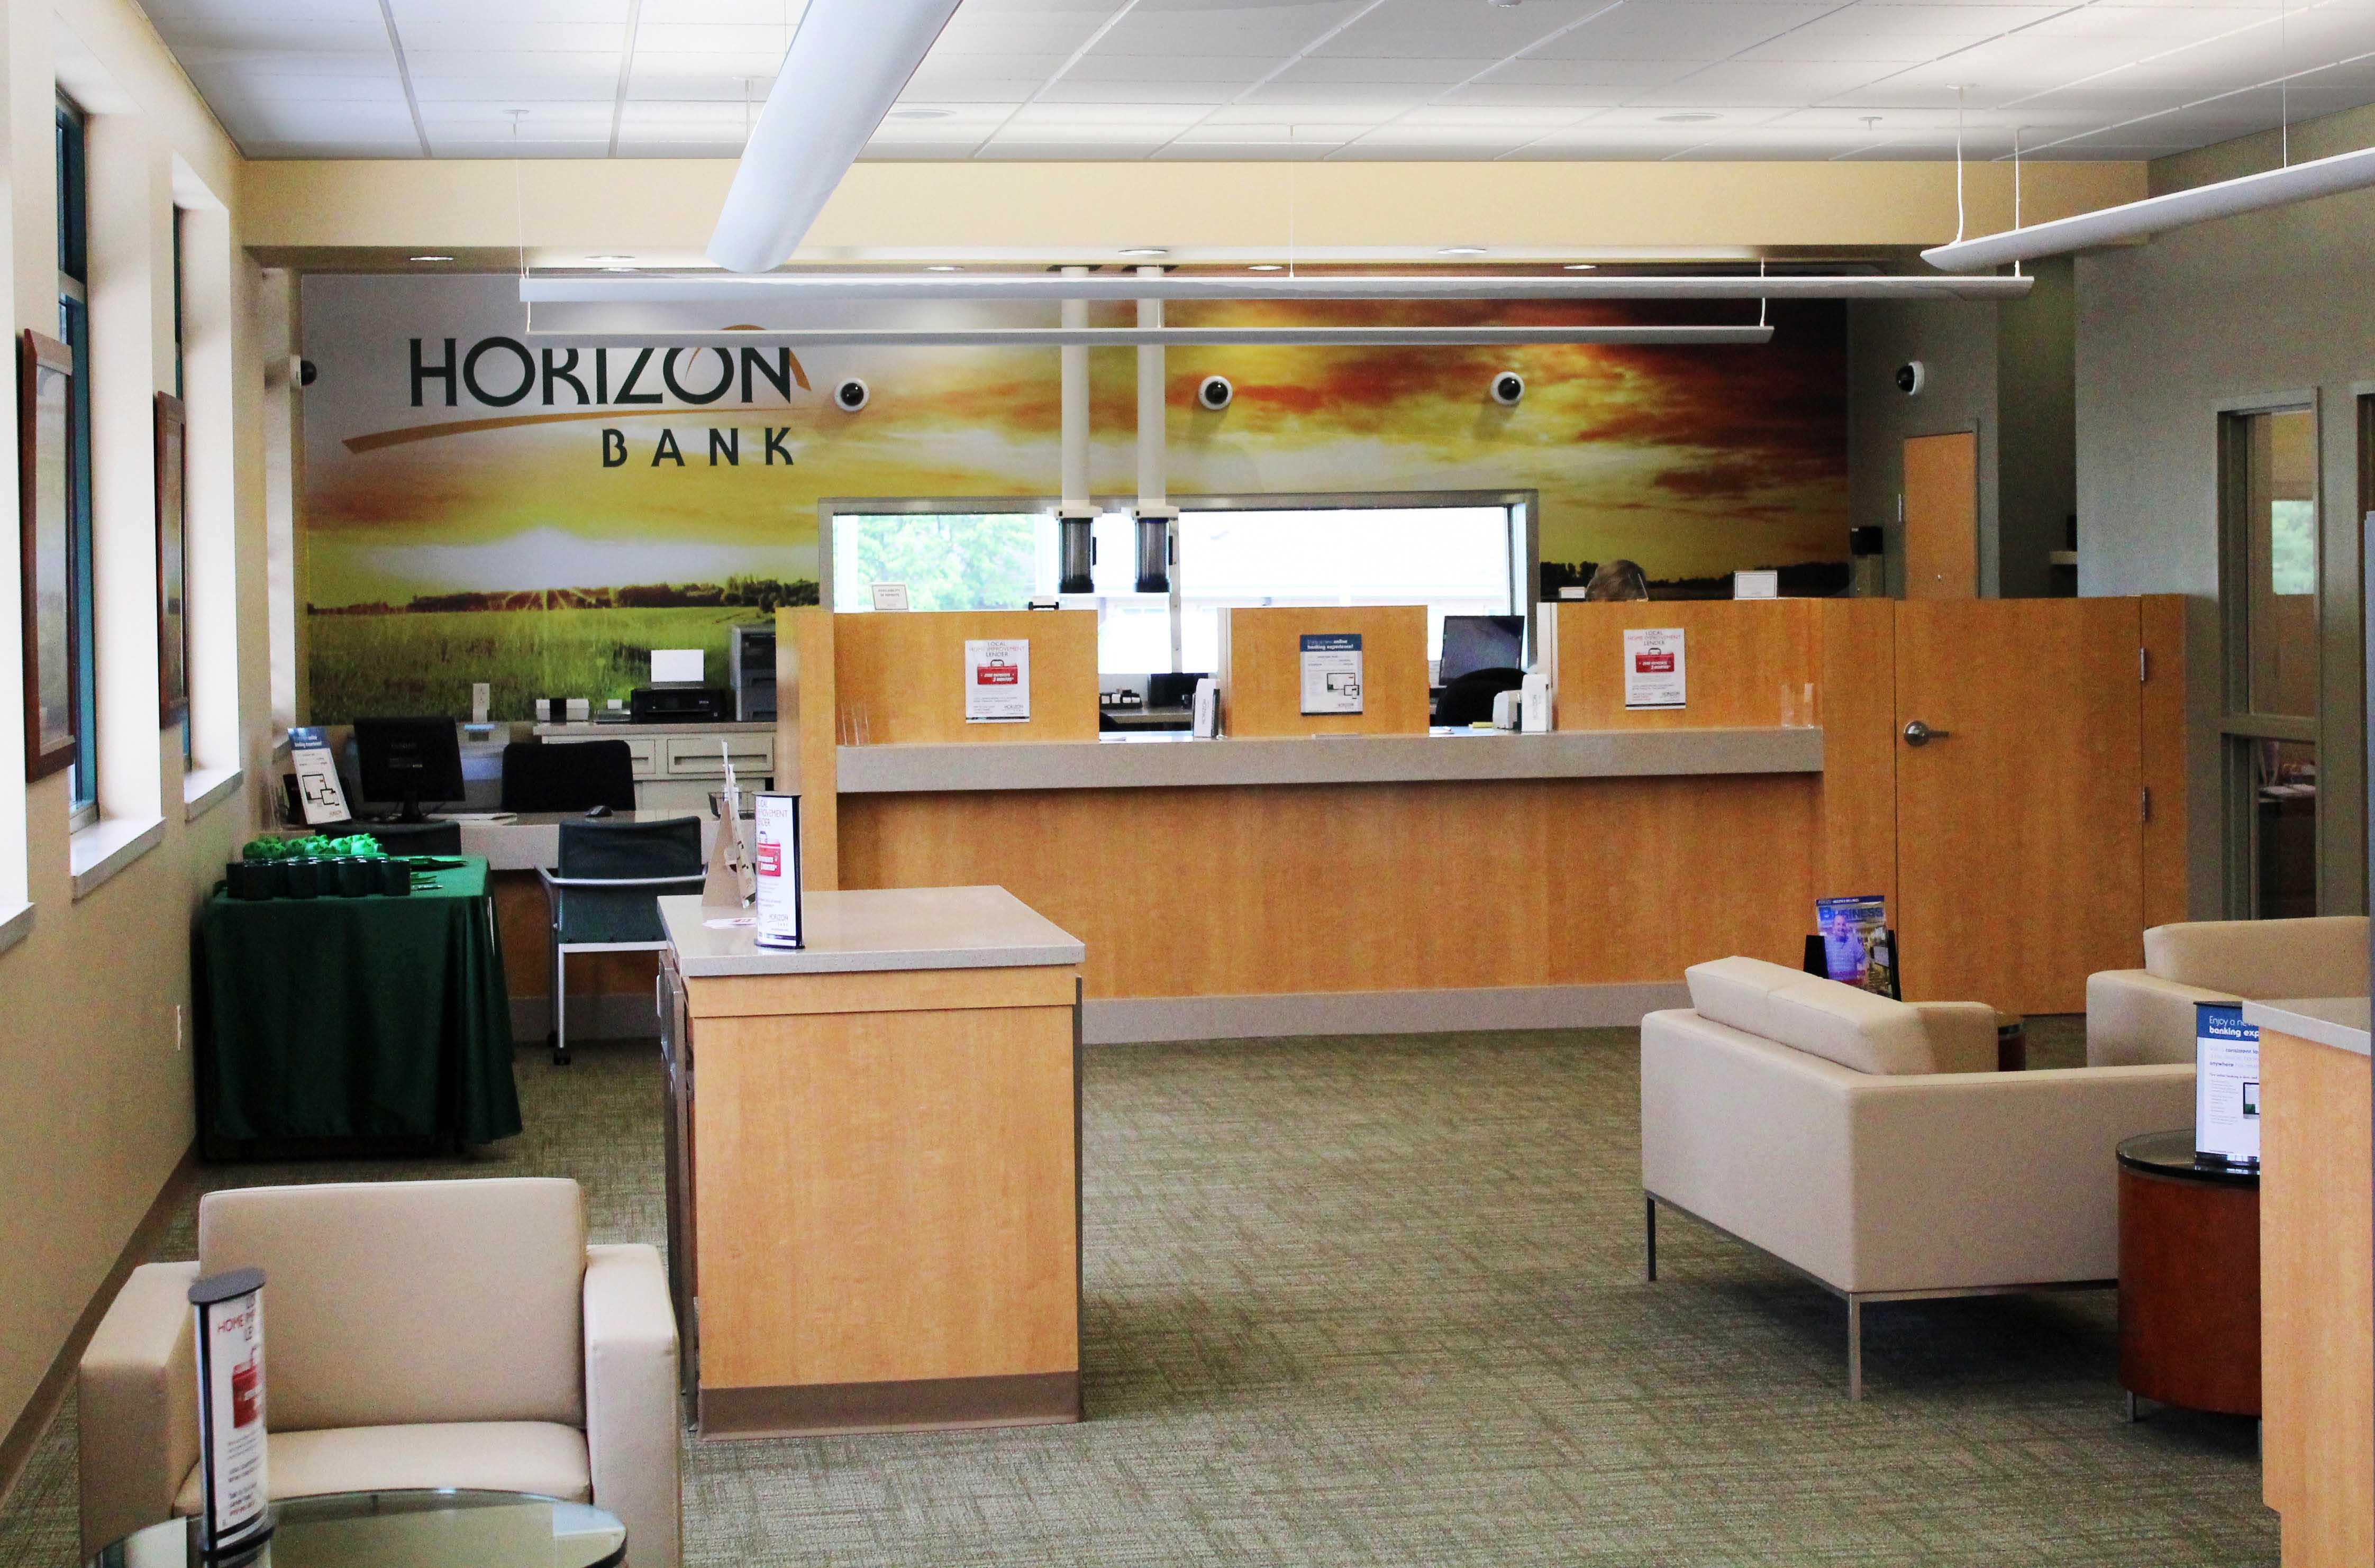 Horizon Bank Carmel interior view